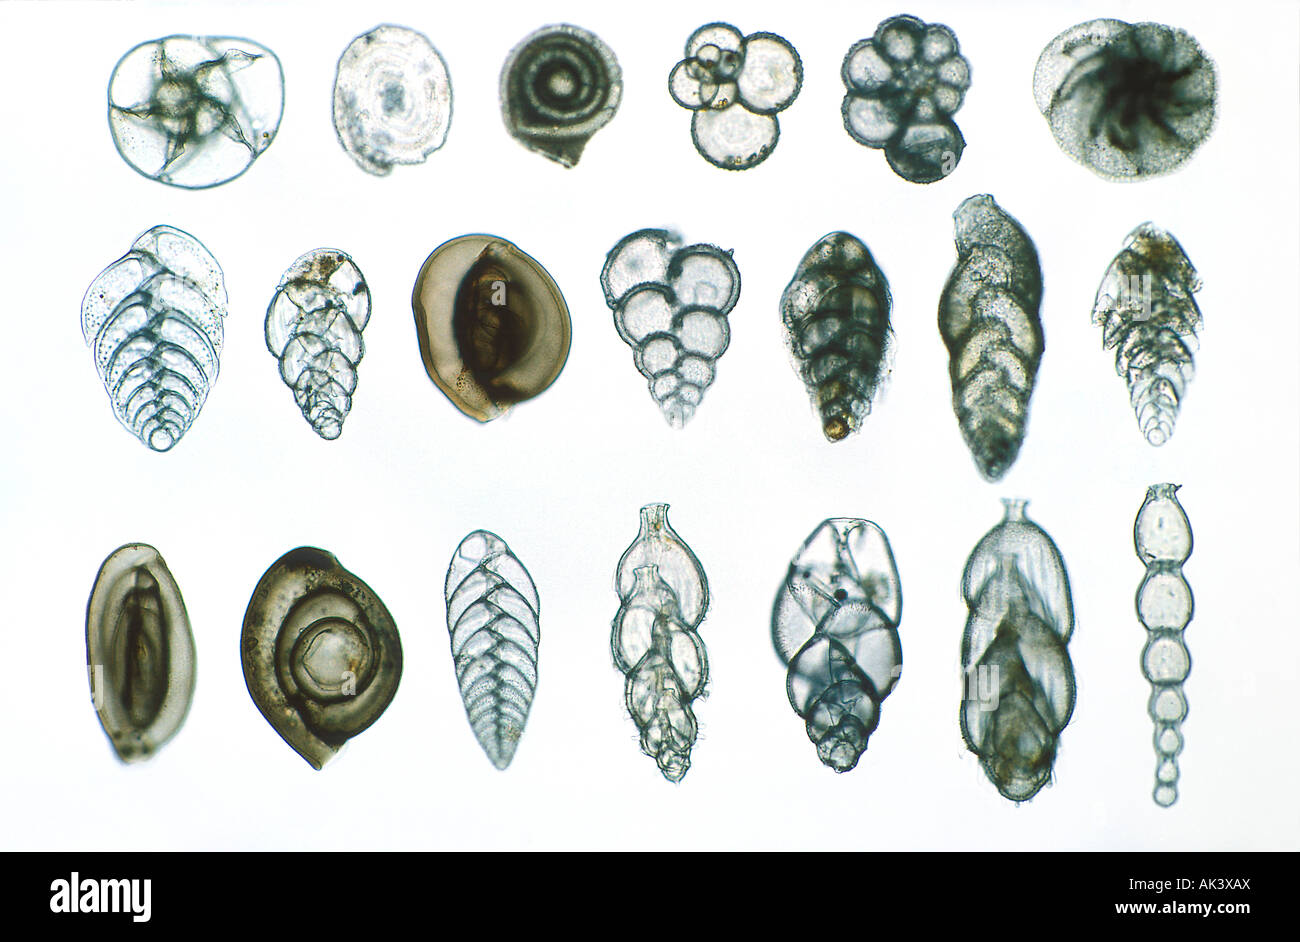 Foraminifera at 50x Single Celled protist - Stock Image